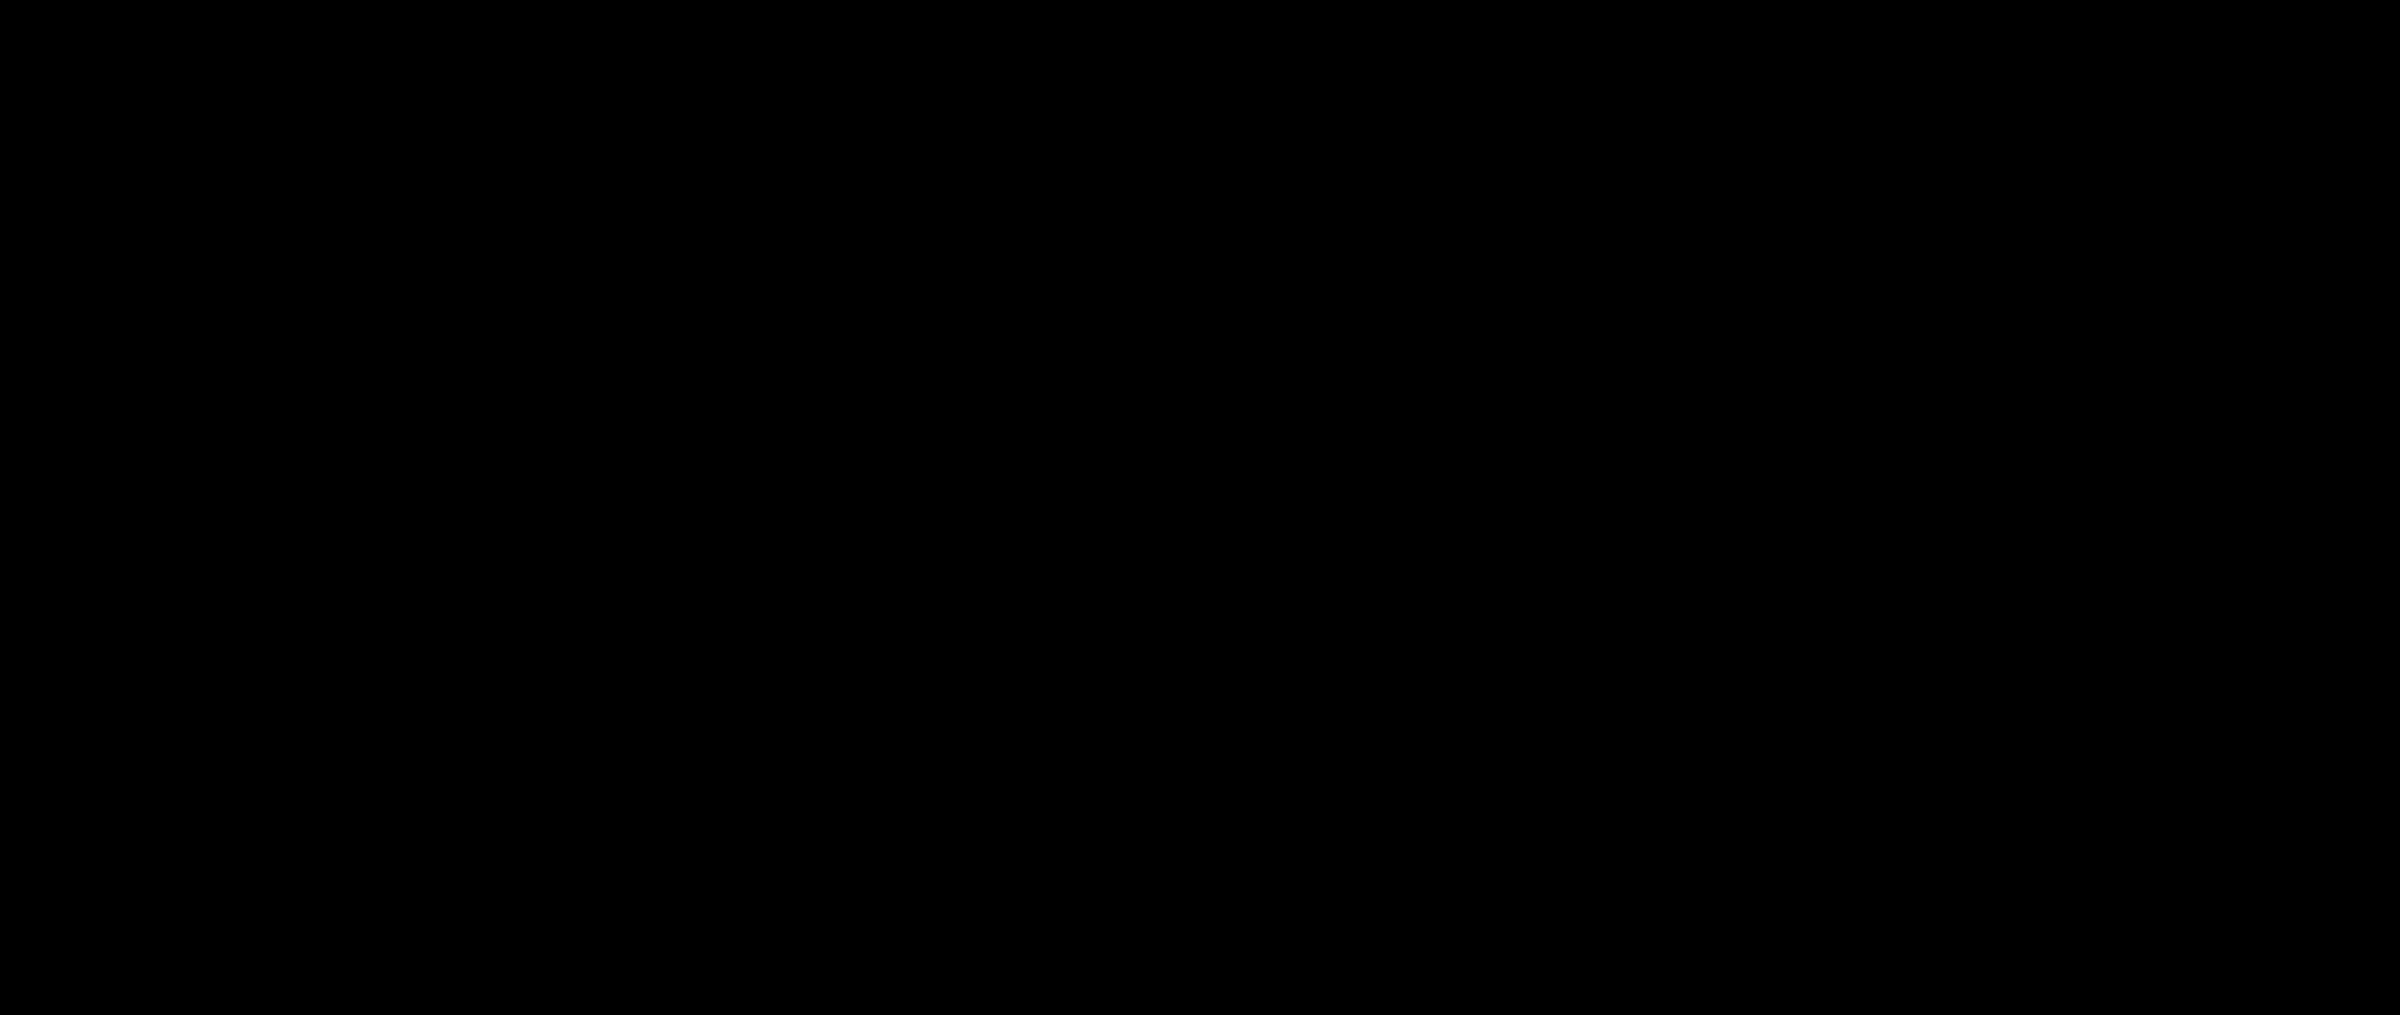 Tnw The Next Web Logo Png Transparent Svg Vector Freebie Supply